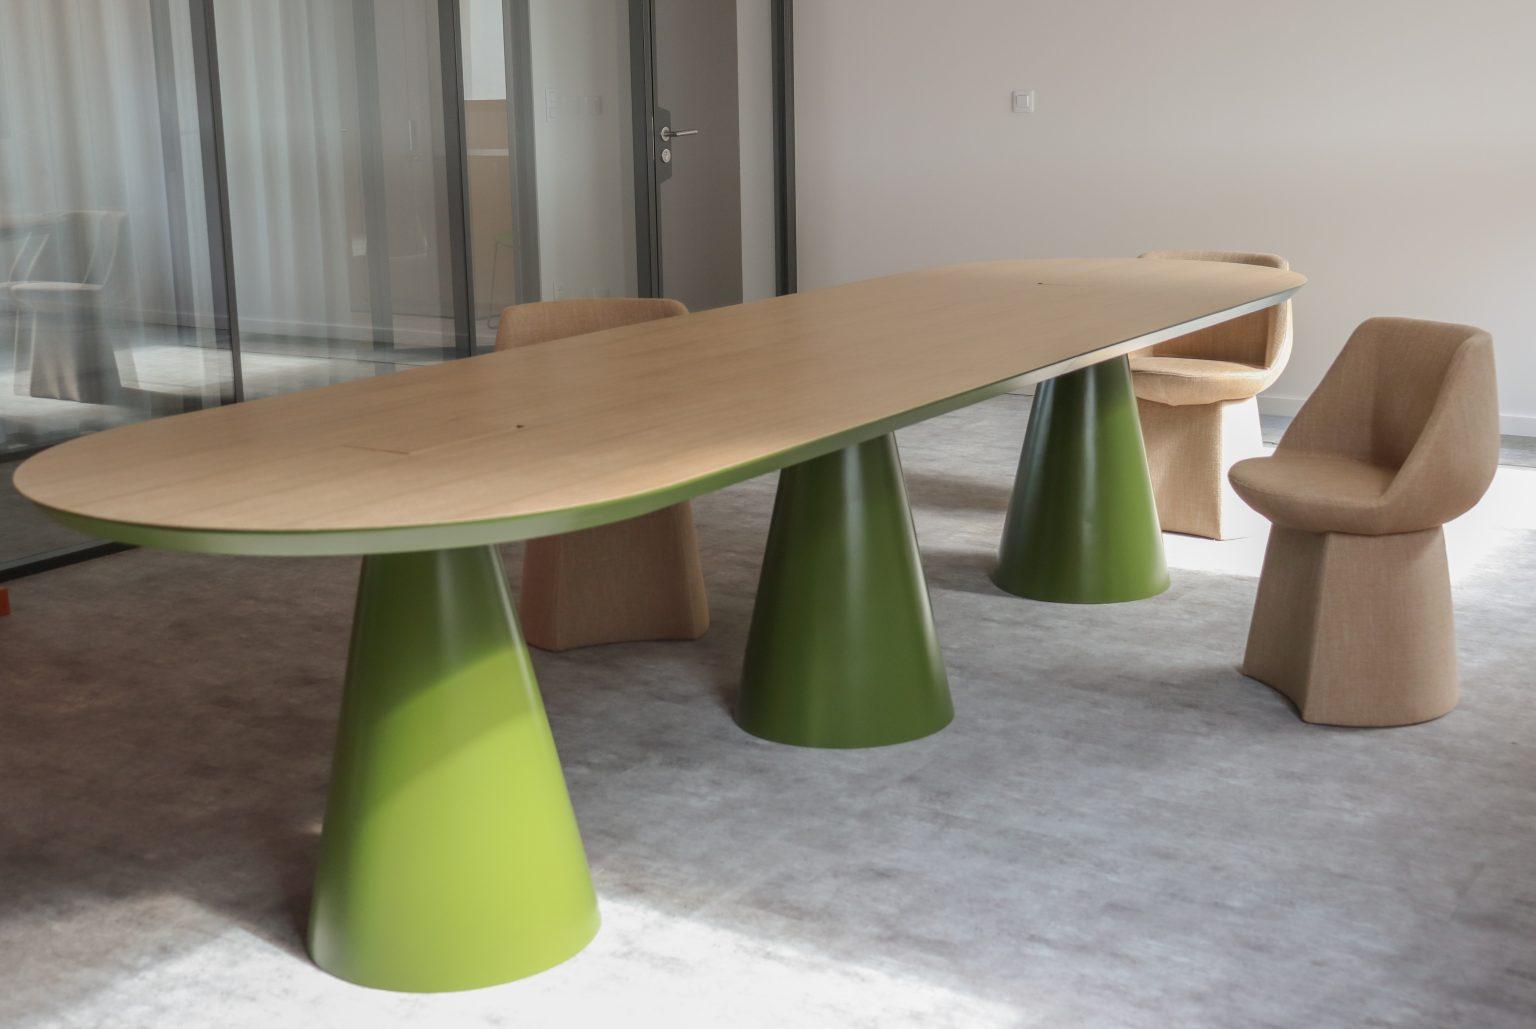 table de réunion design table seventies gigi desgin